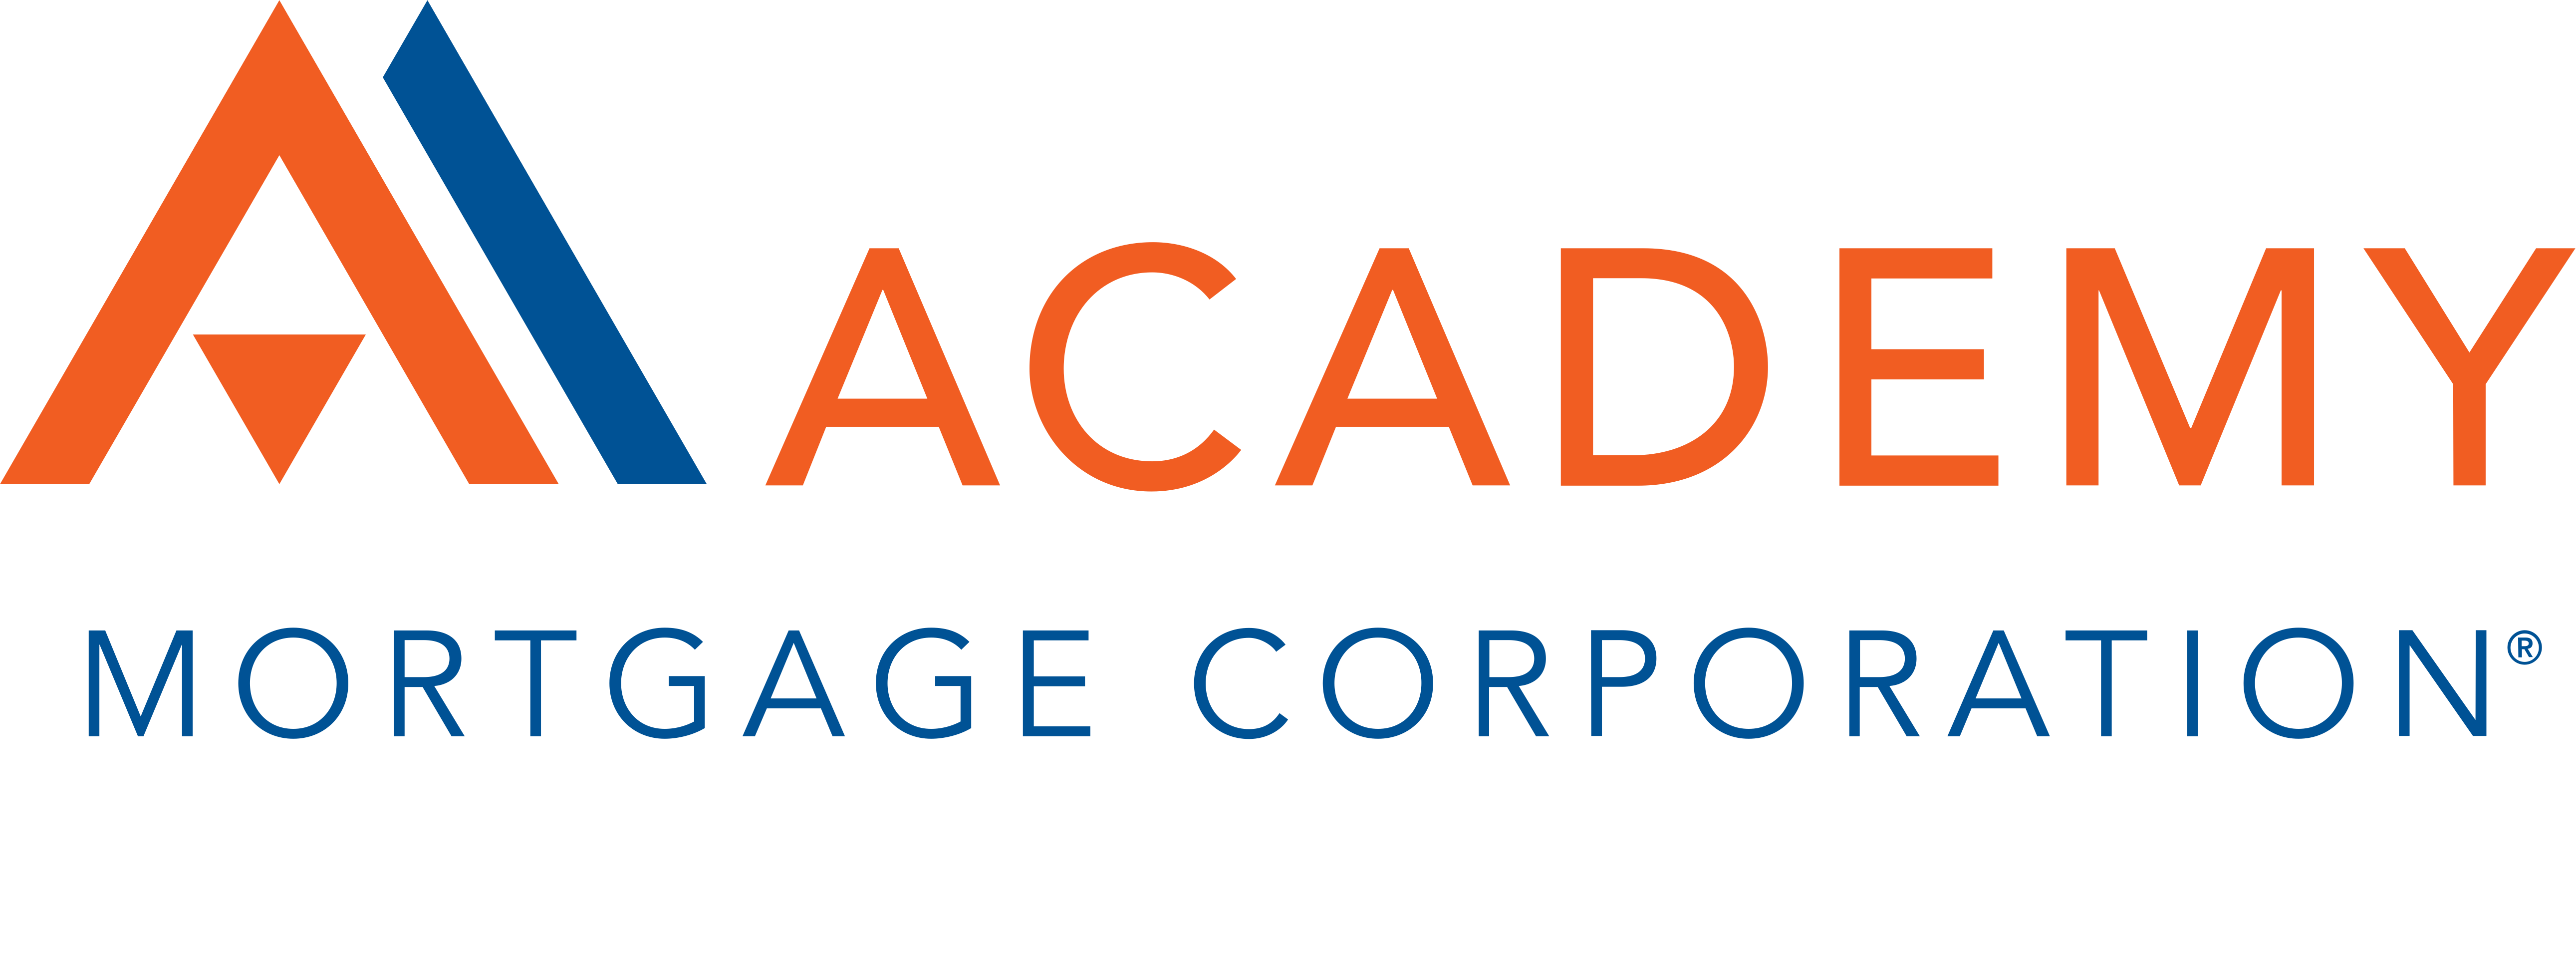 academy-logo-2020